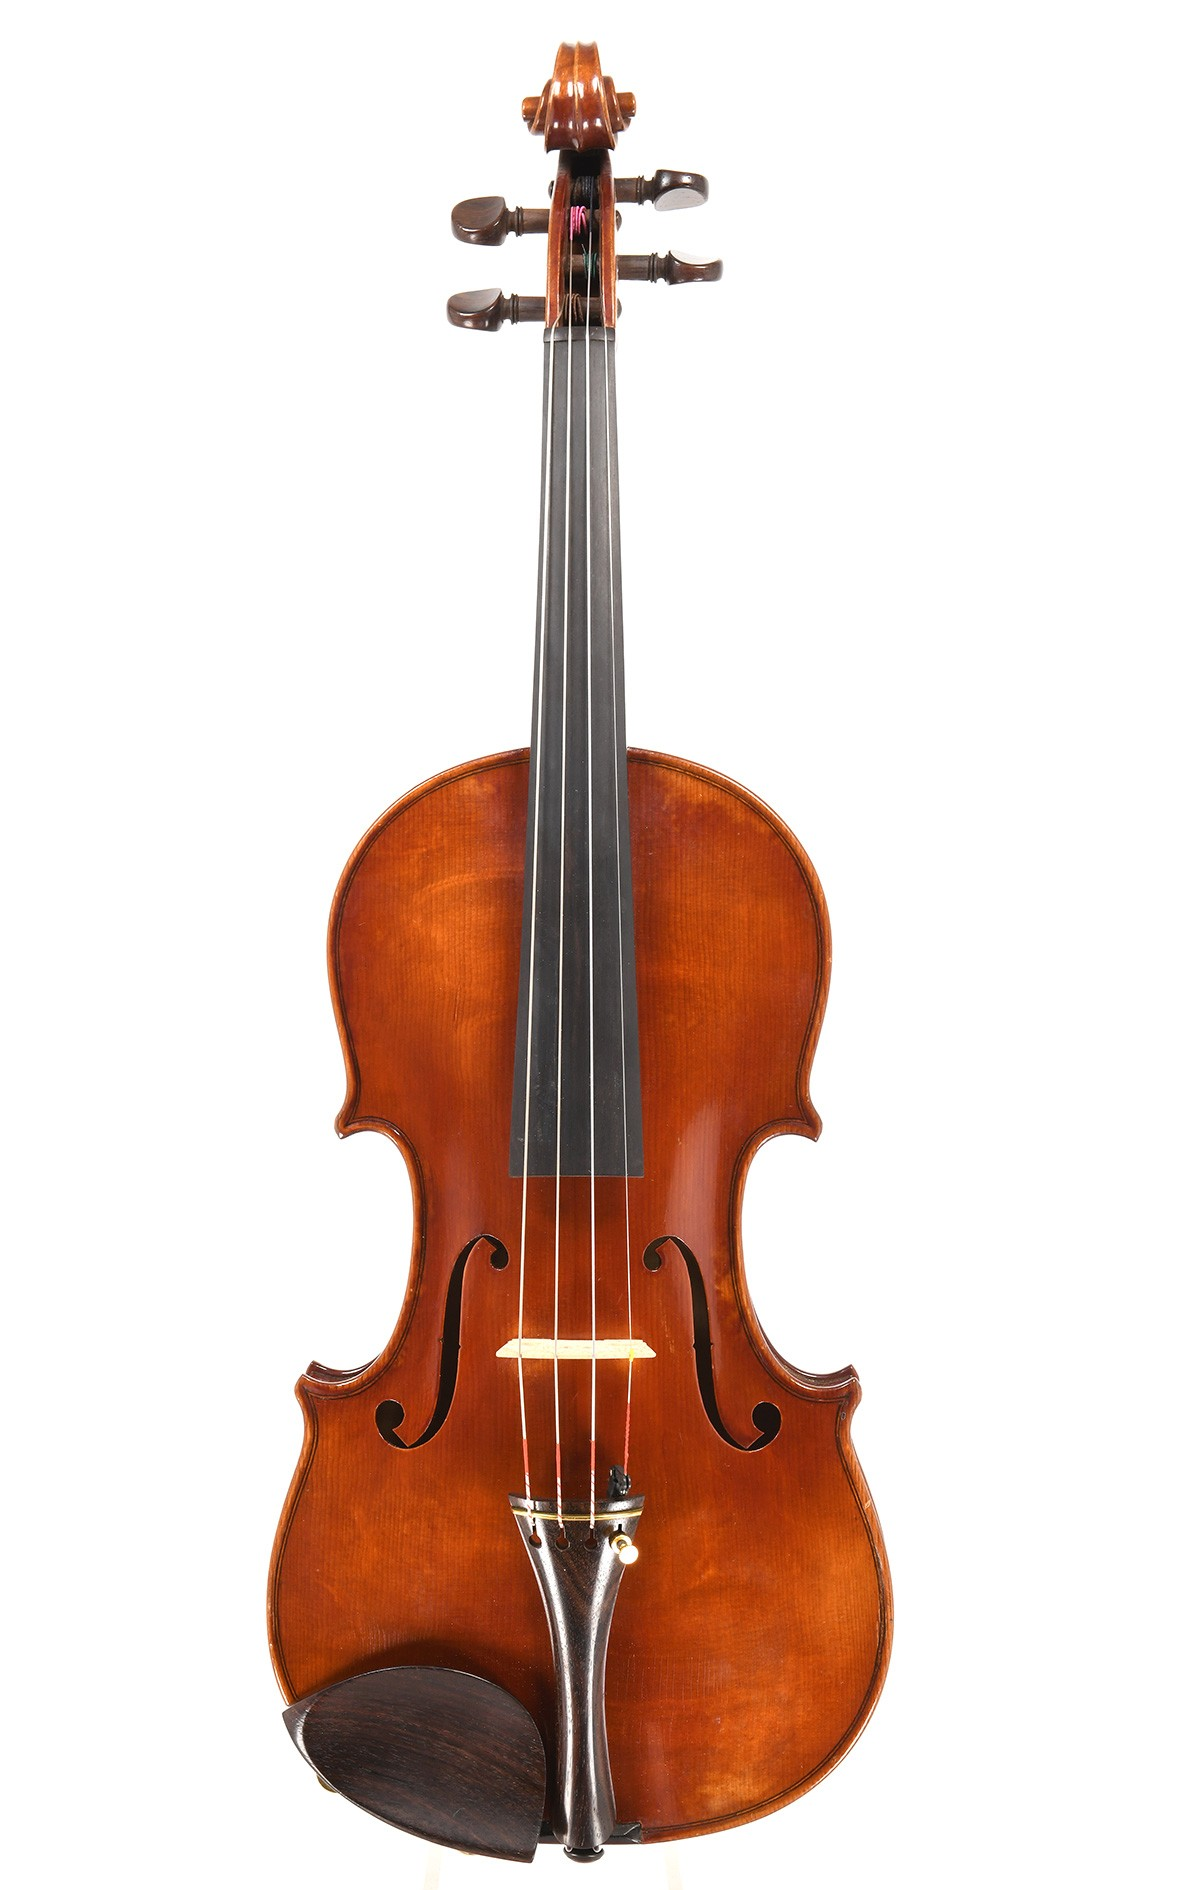 French violin by Amedee Dieudonne, Mirecourt